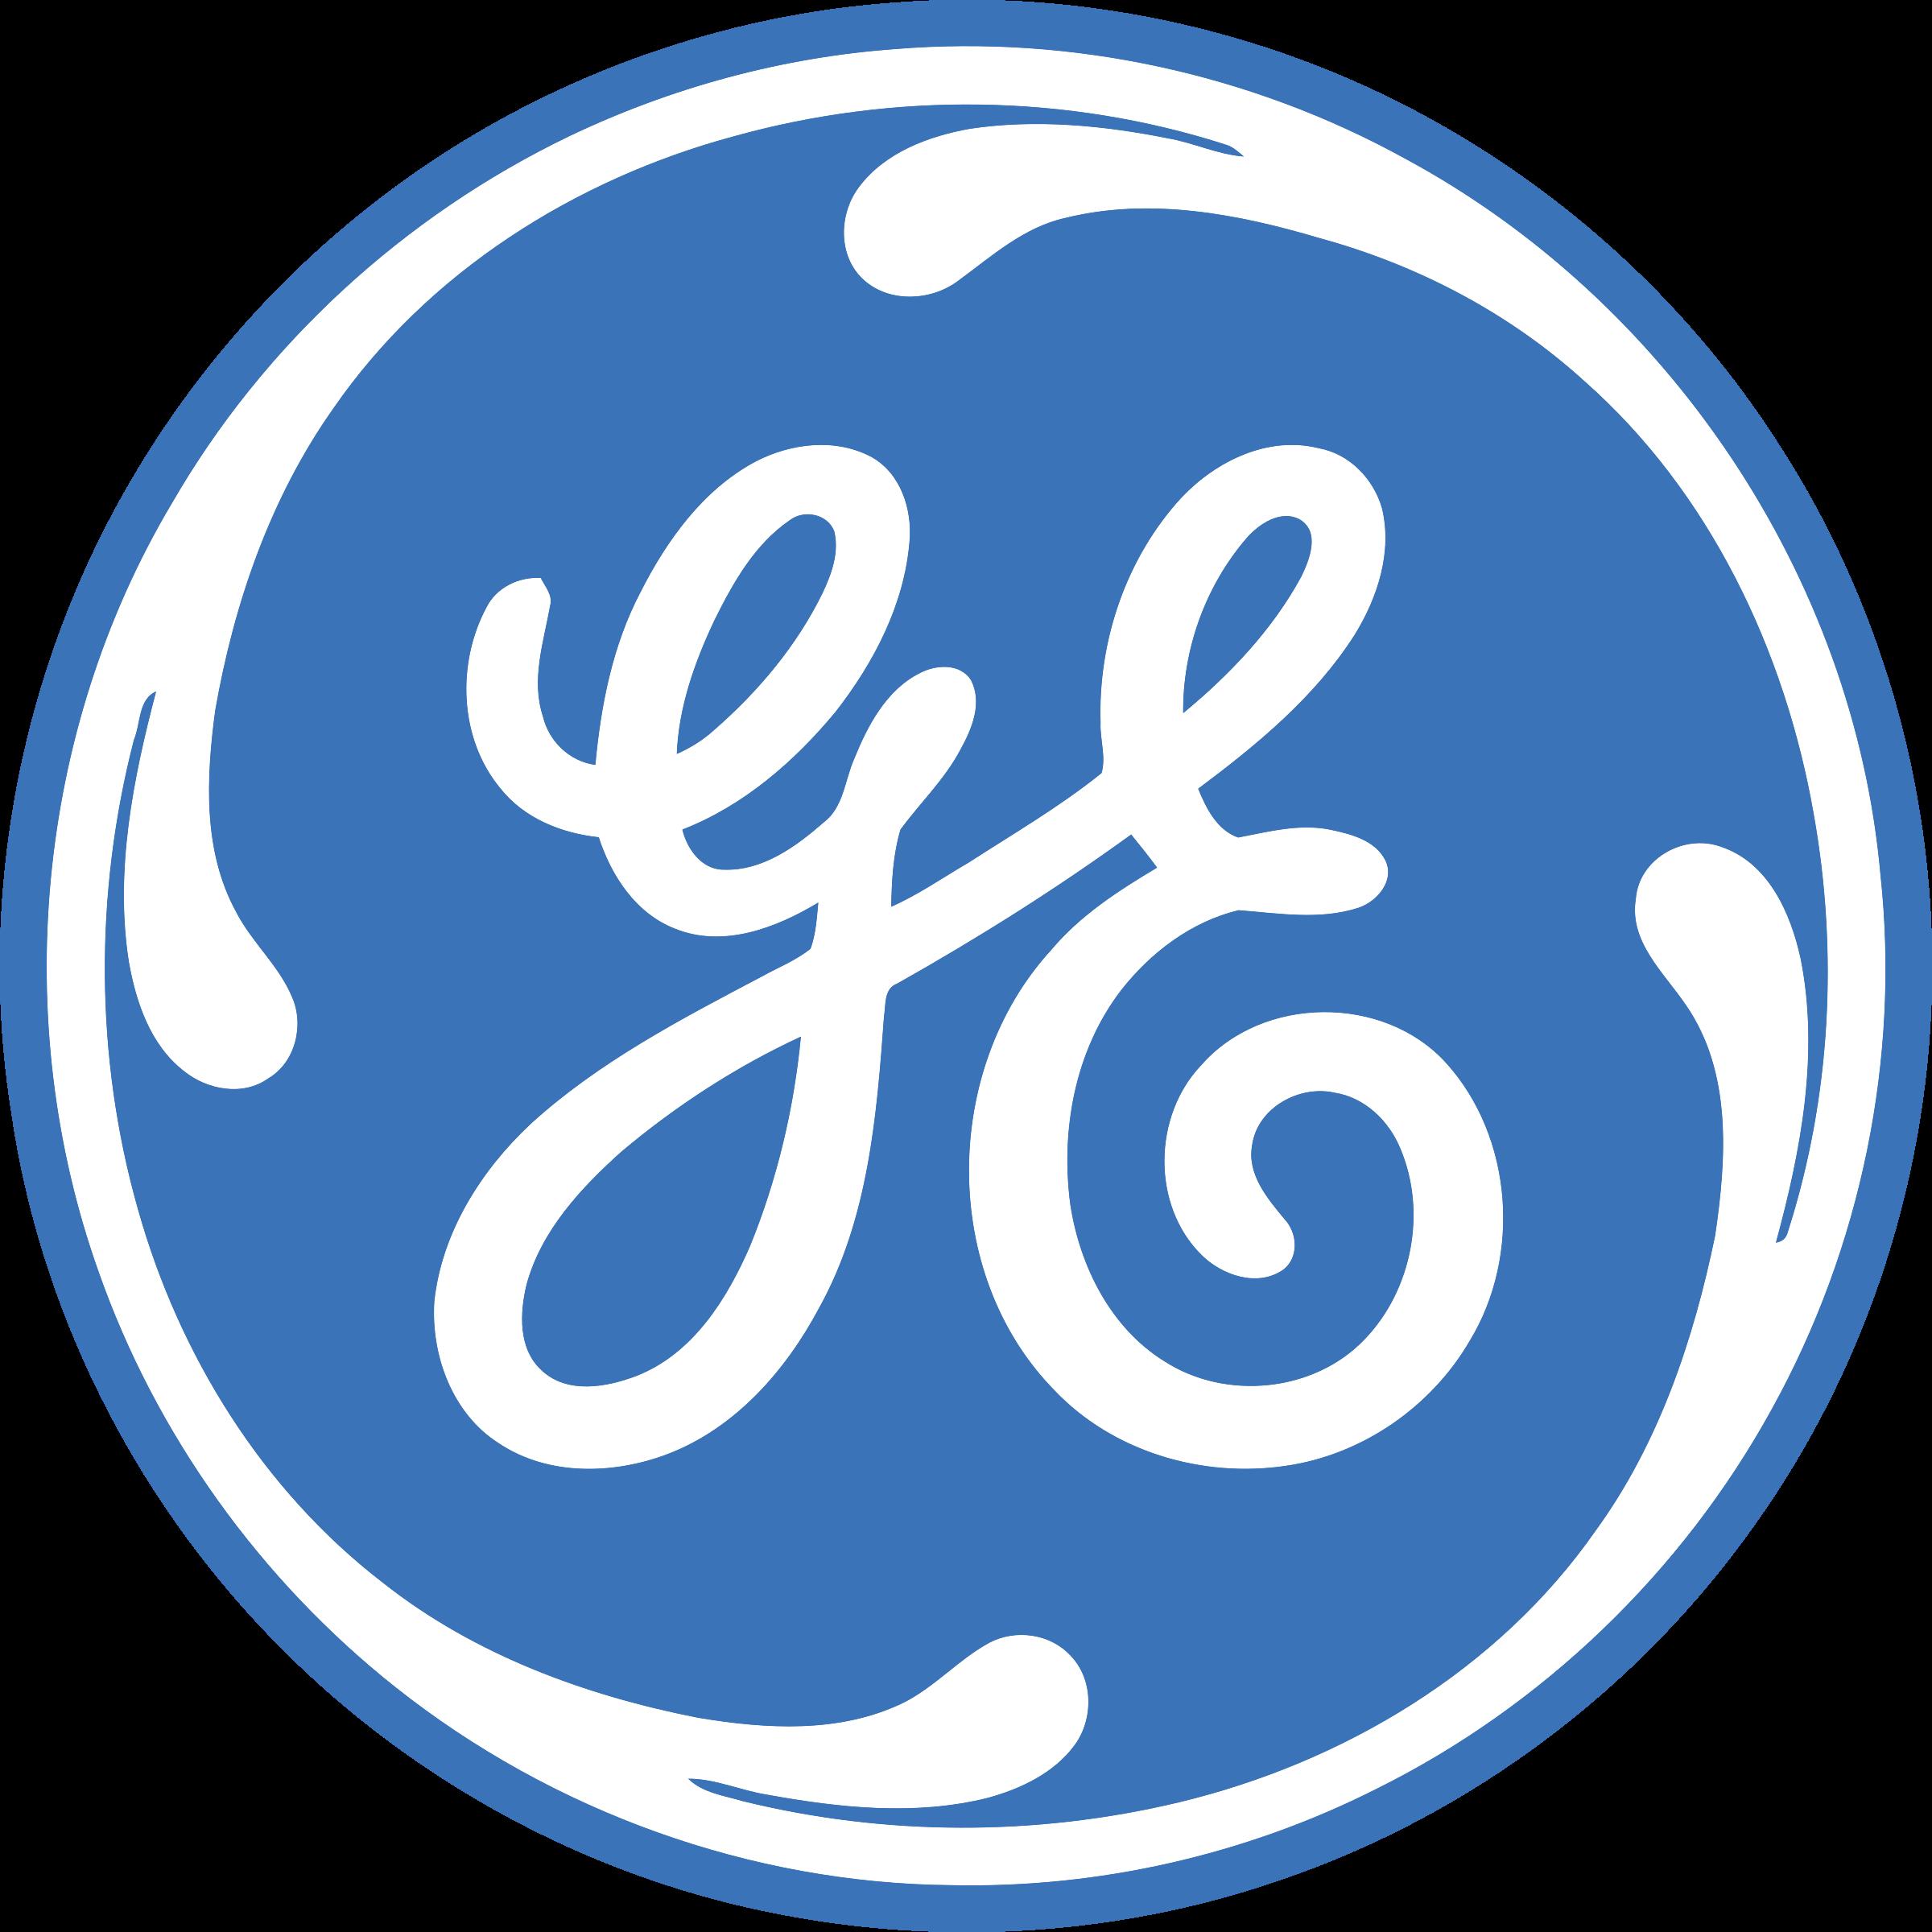 general electric ge logo png transparent svg vector freebie supply rh freebiesupply com ge healthcare logo vector ge logo vector free download